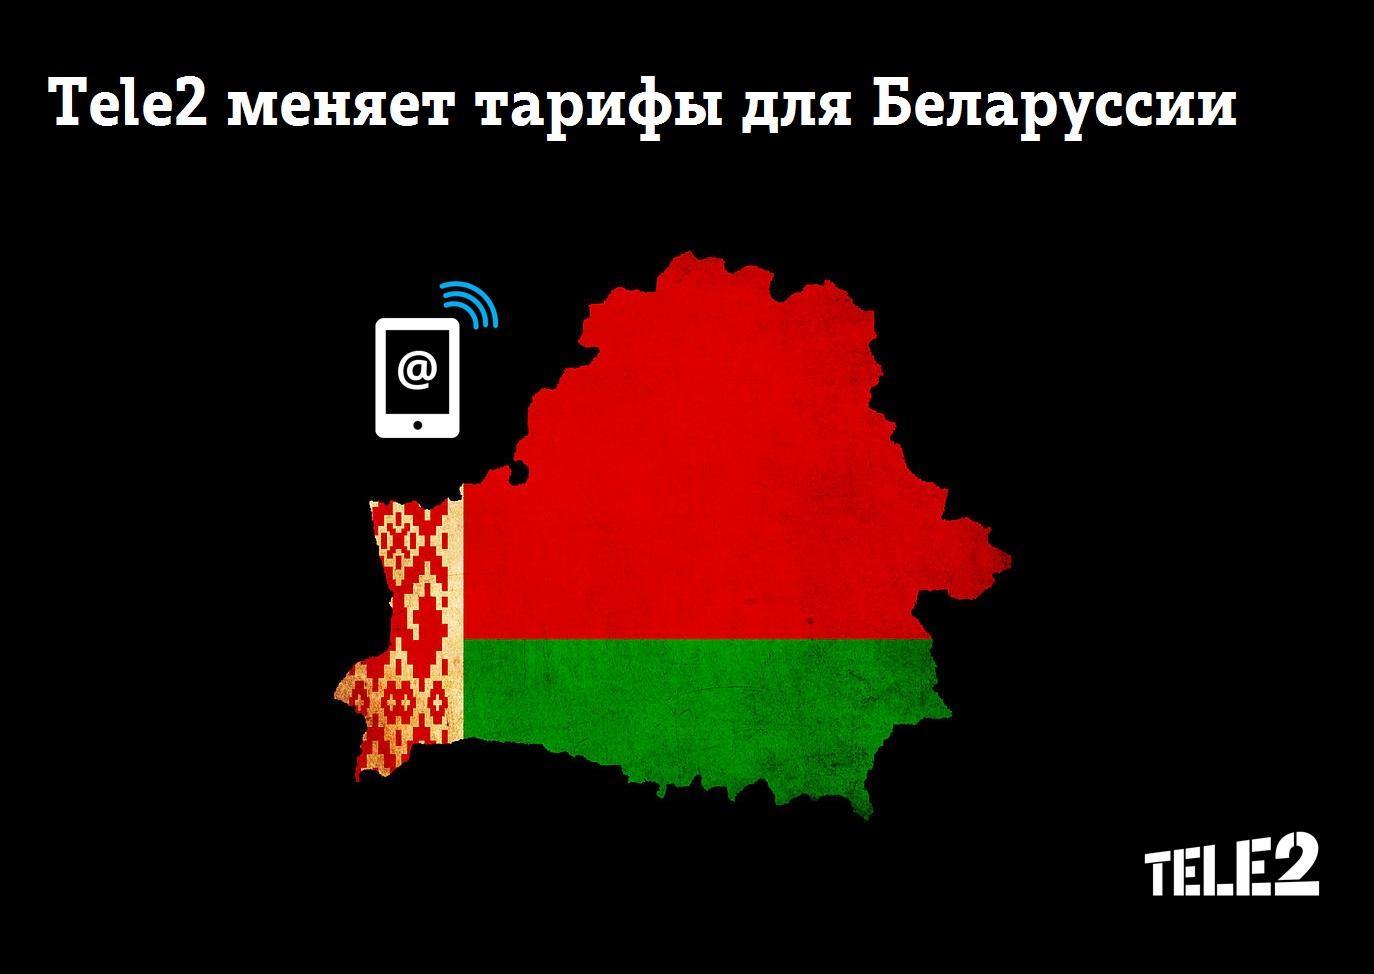 Tele2 меняет тарифы для Беларуссии 1